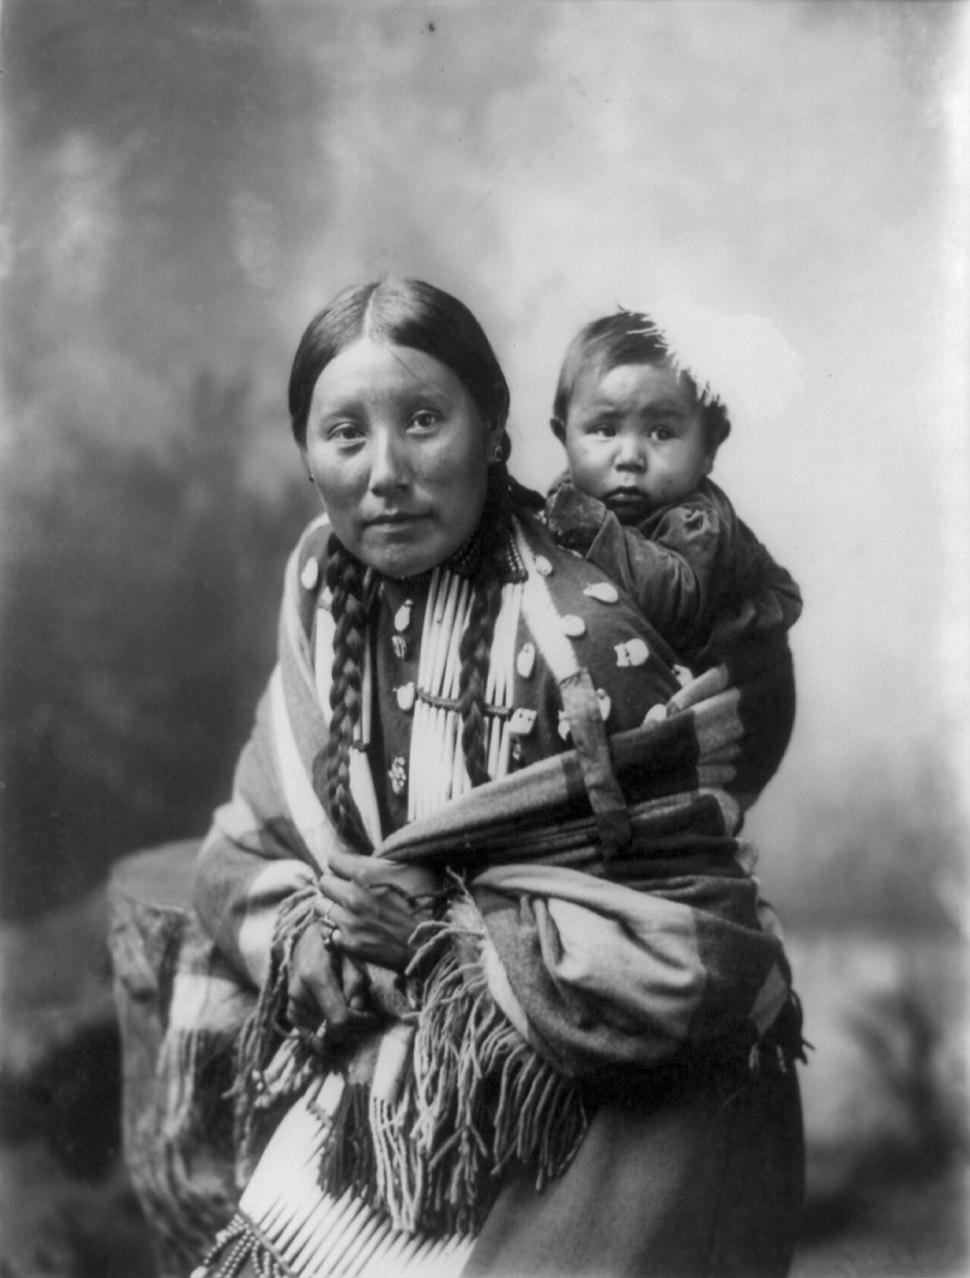 Stella Yellow Shirt, Dakota Sioux, with baby, by Heyn Photo, 1899